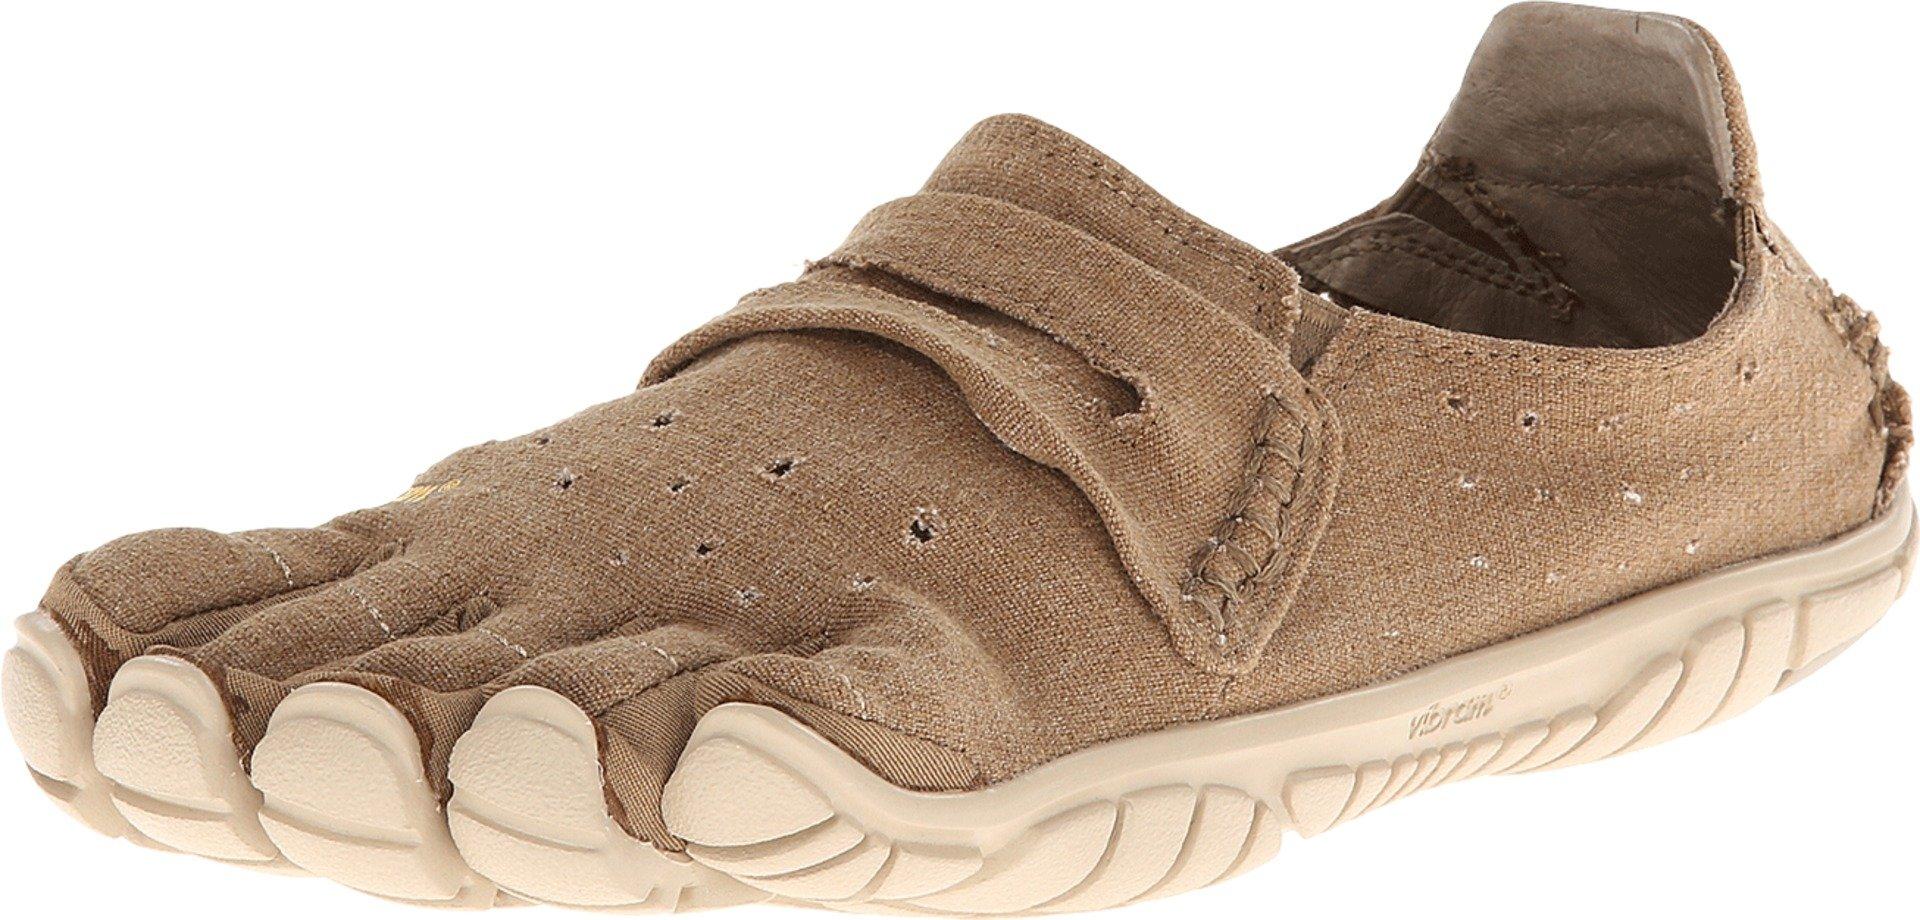 Vibram FiveFingers Men's CVT-Hemp Khaki Sneaker 41 M EU / 9-9.5 D(M) US